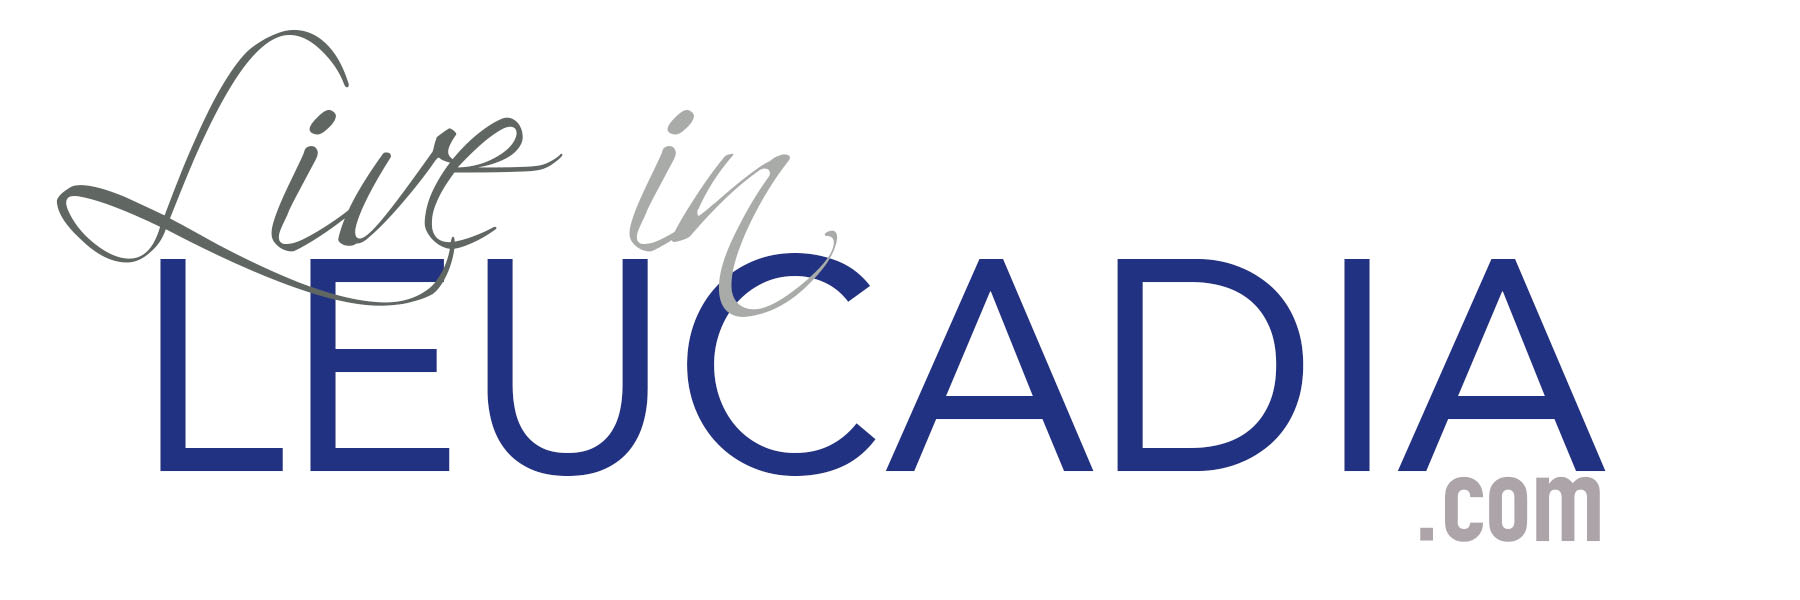 #1 LEUCADIA REAL ESTATE & Lifestyle Website- Love Leucadia Homes!